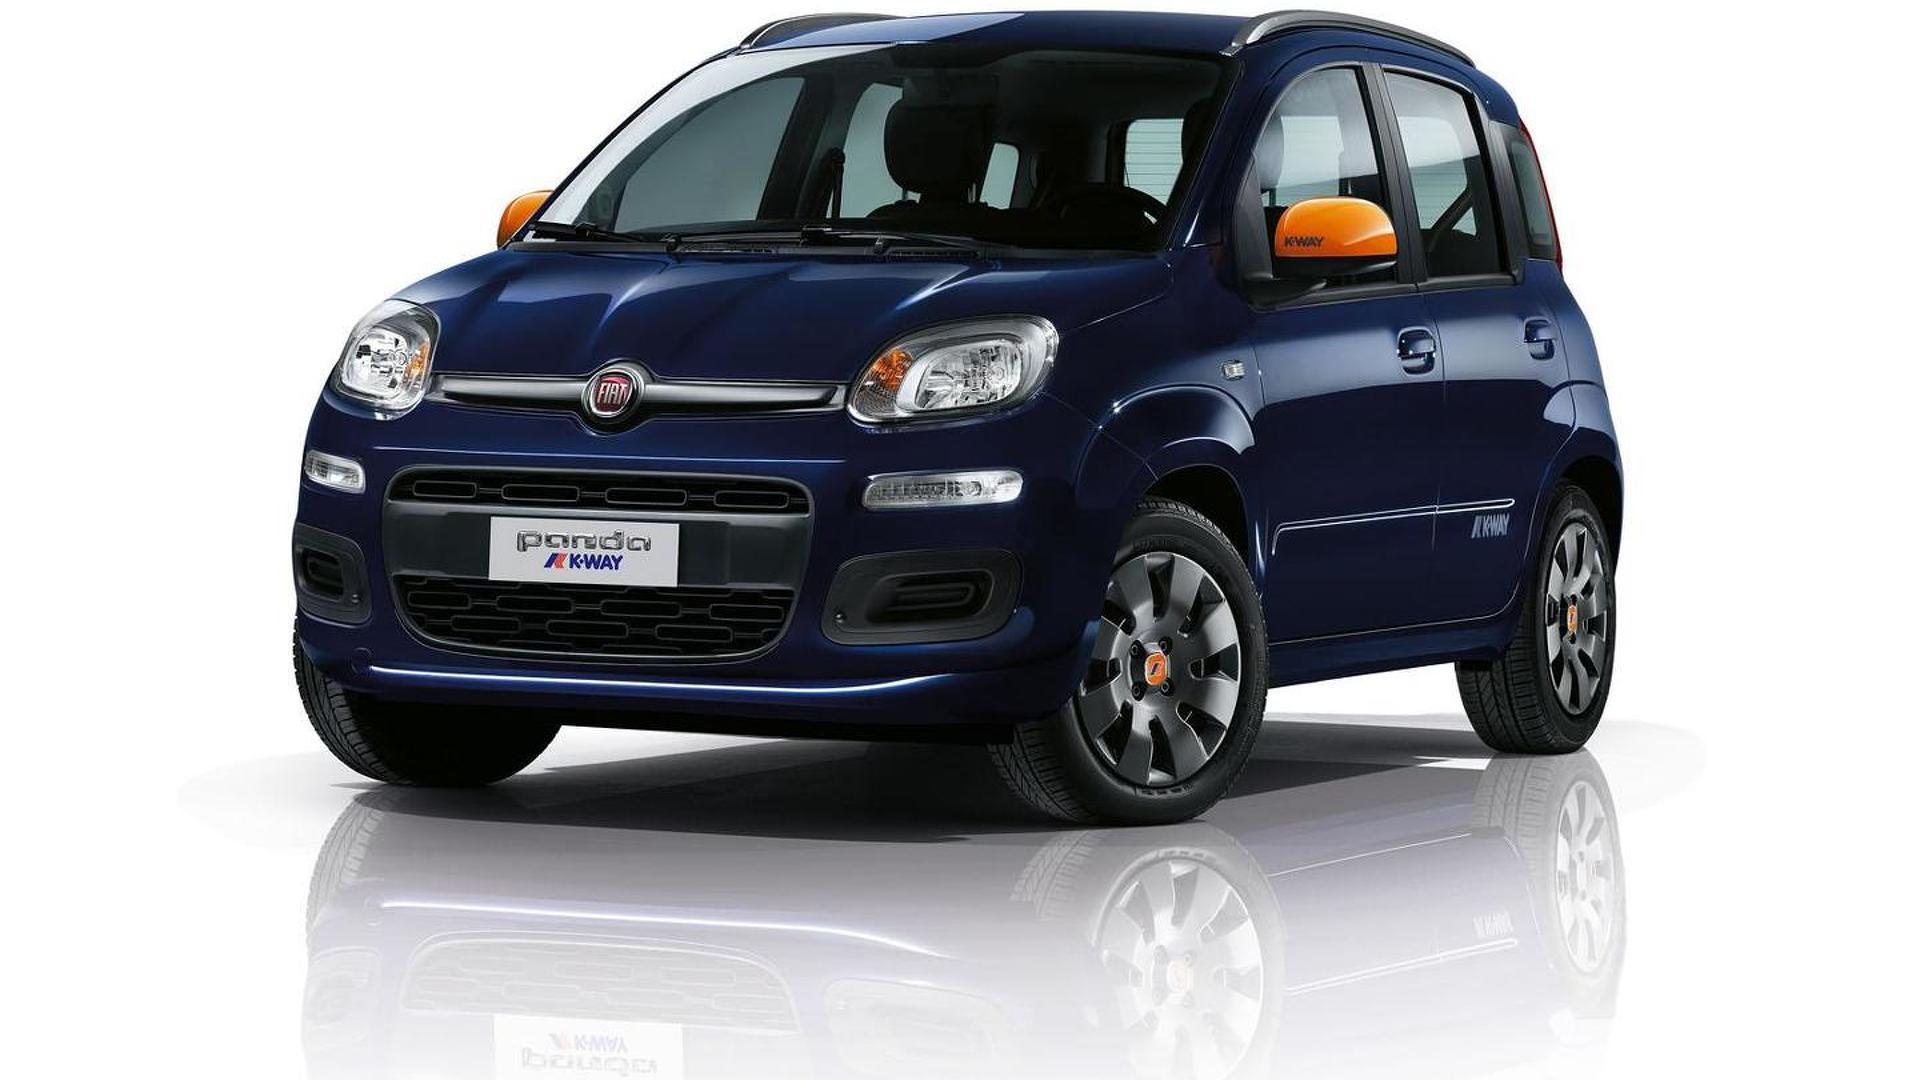 Fiat Panda K-Way revealed